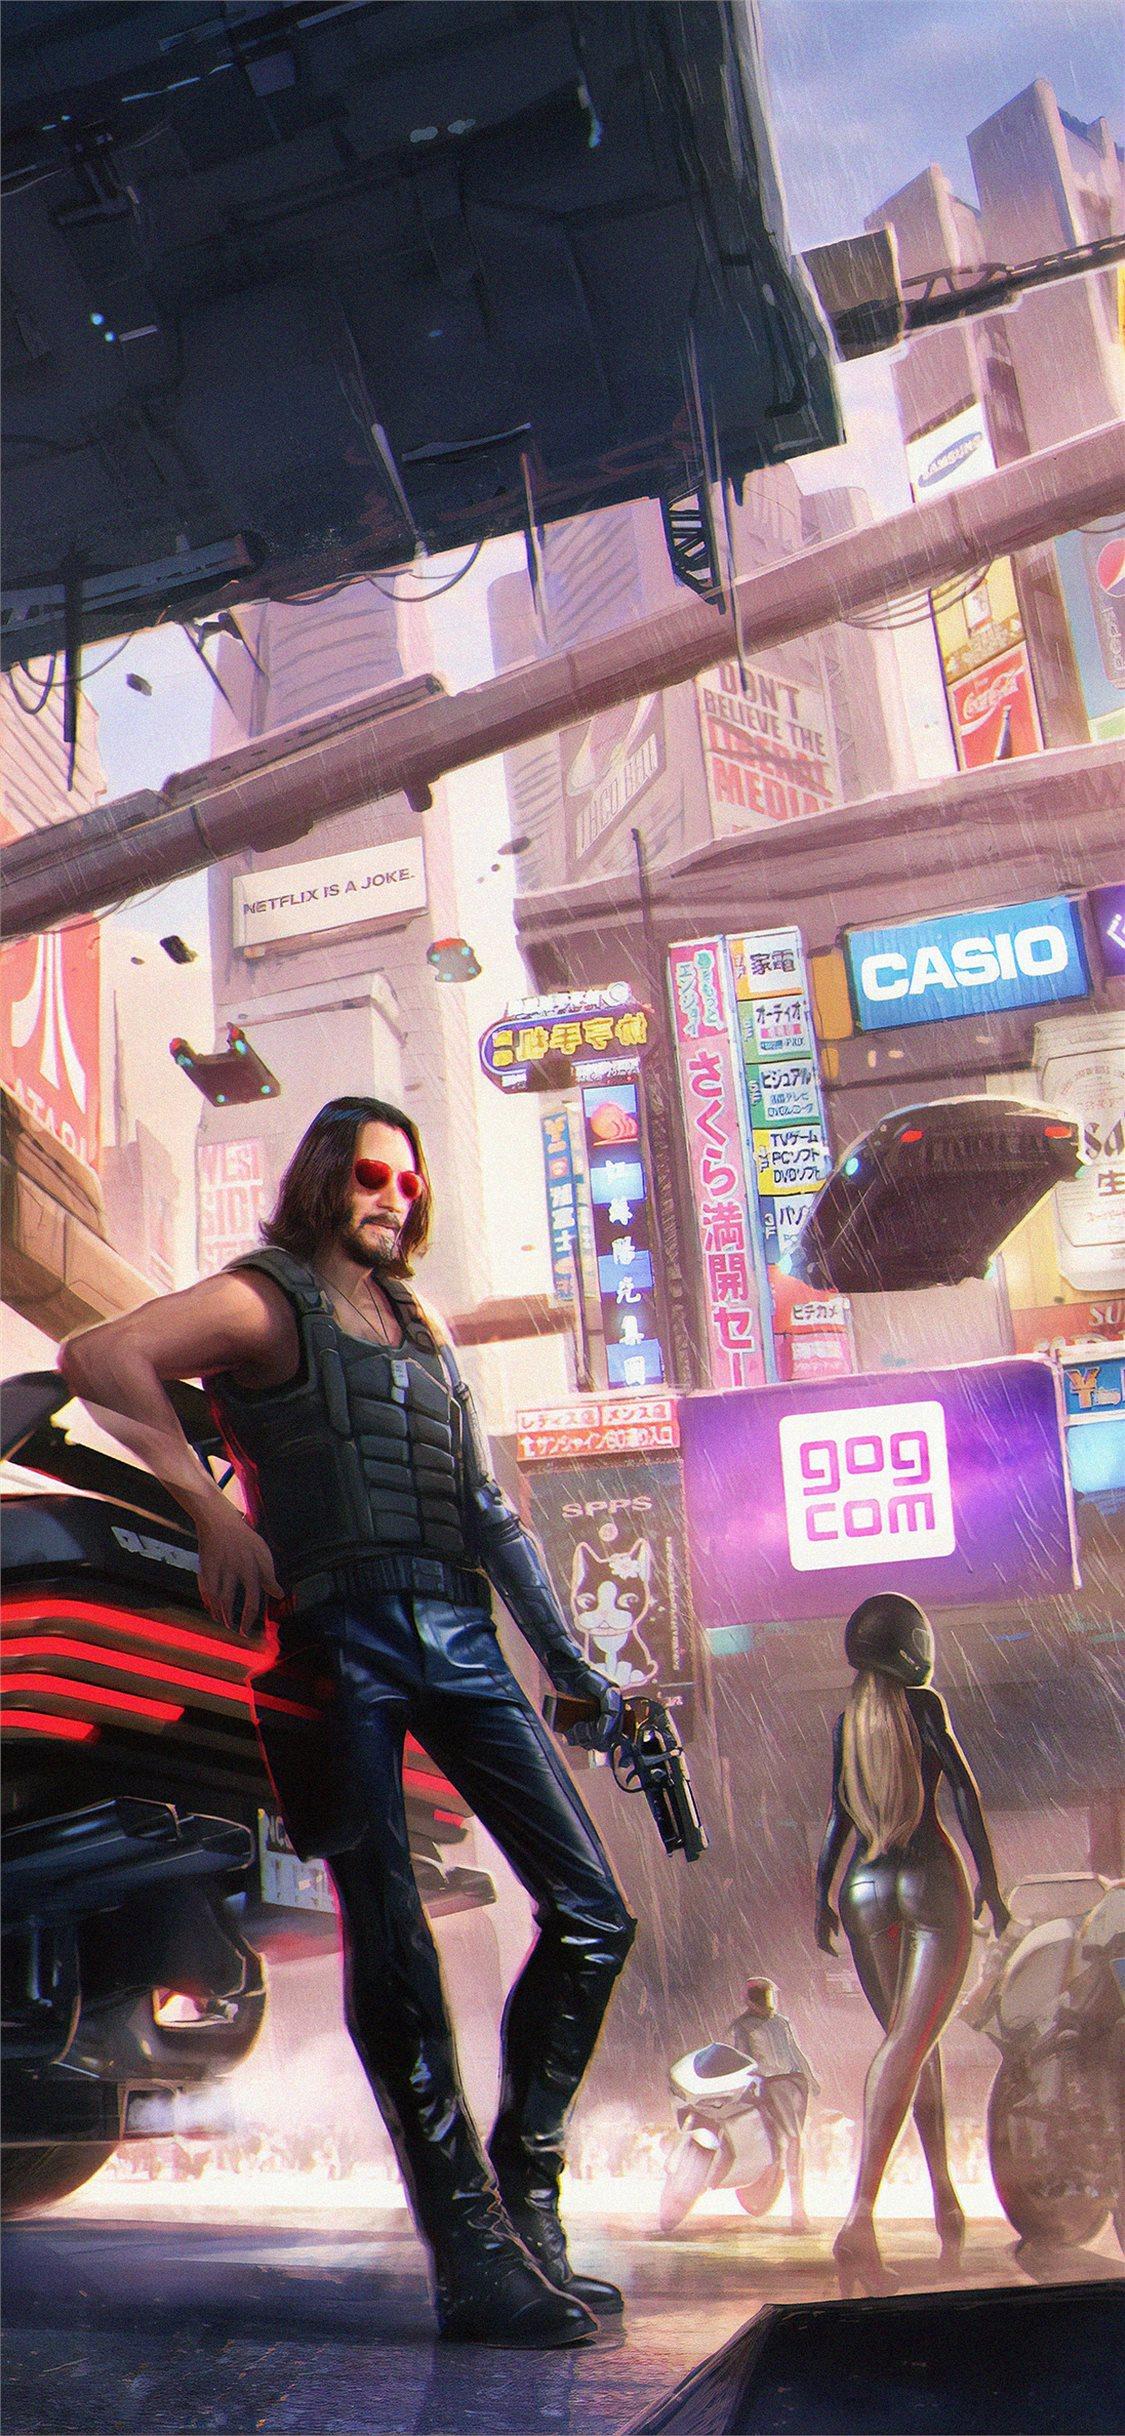 Recklessly: Cyberpunk 2077 Wallpaper 4k Iphone